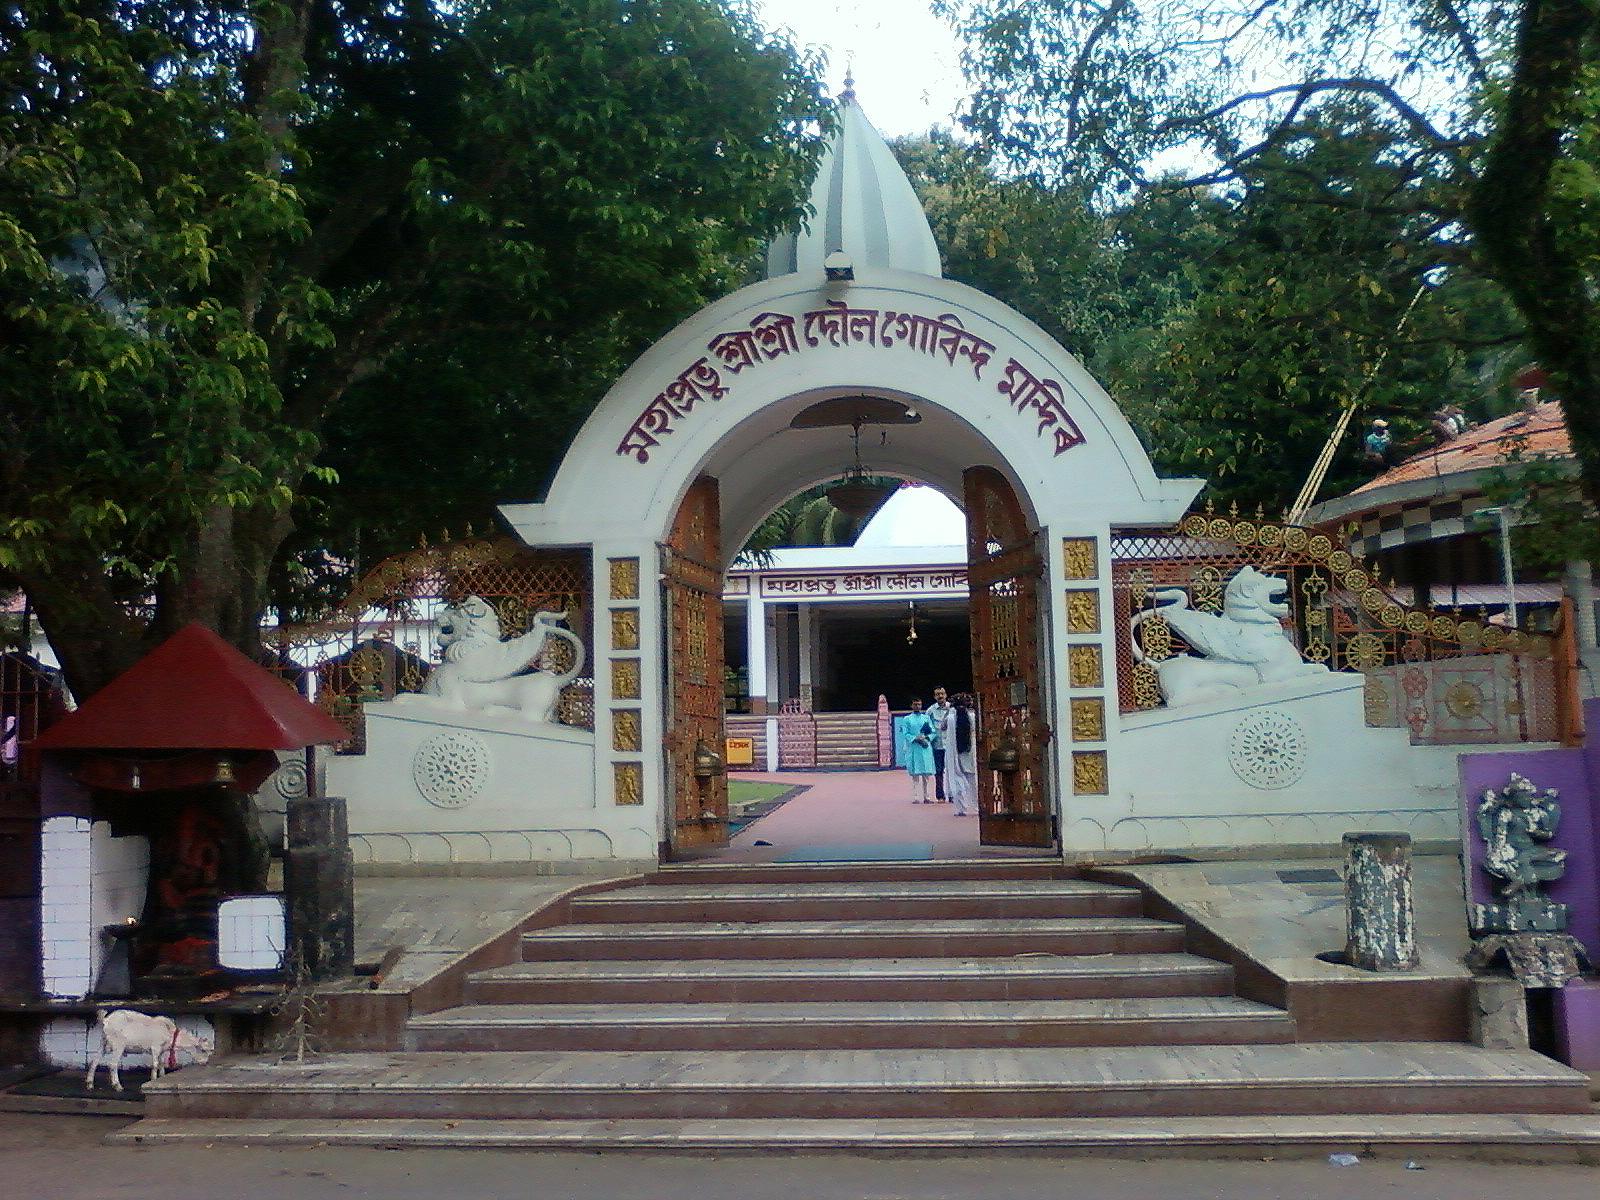 Doul Govinda Temple, Kamrup - Assam, India